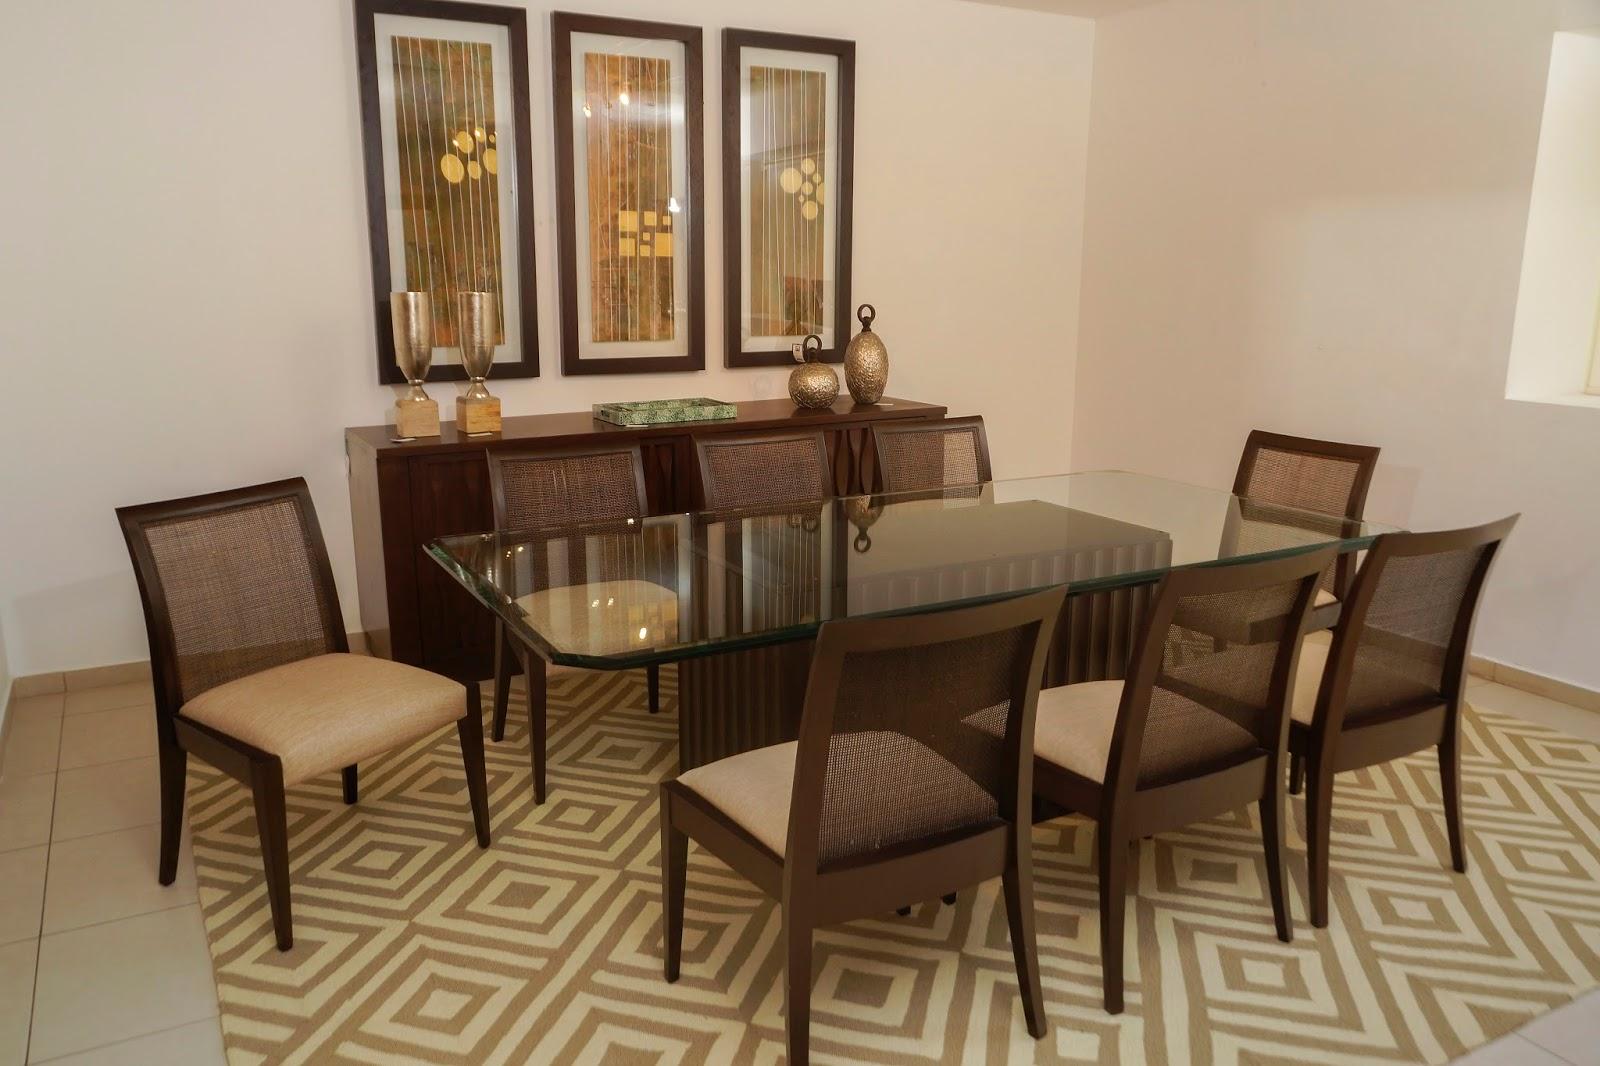 Muebles Merida Affordable Affordable Muebles Y Objetos Merida  # Muebles Merida Yucatan